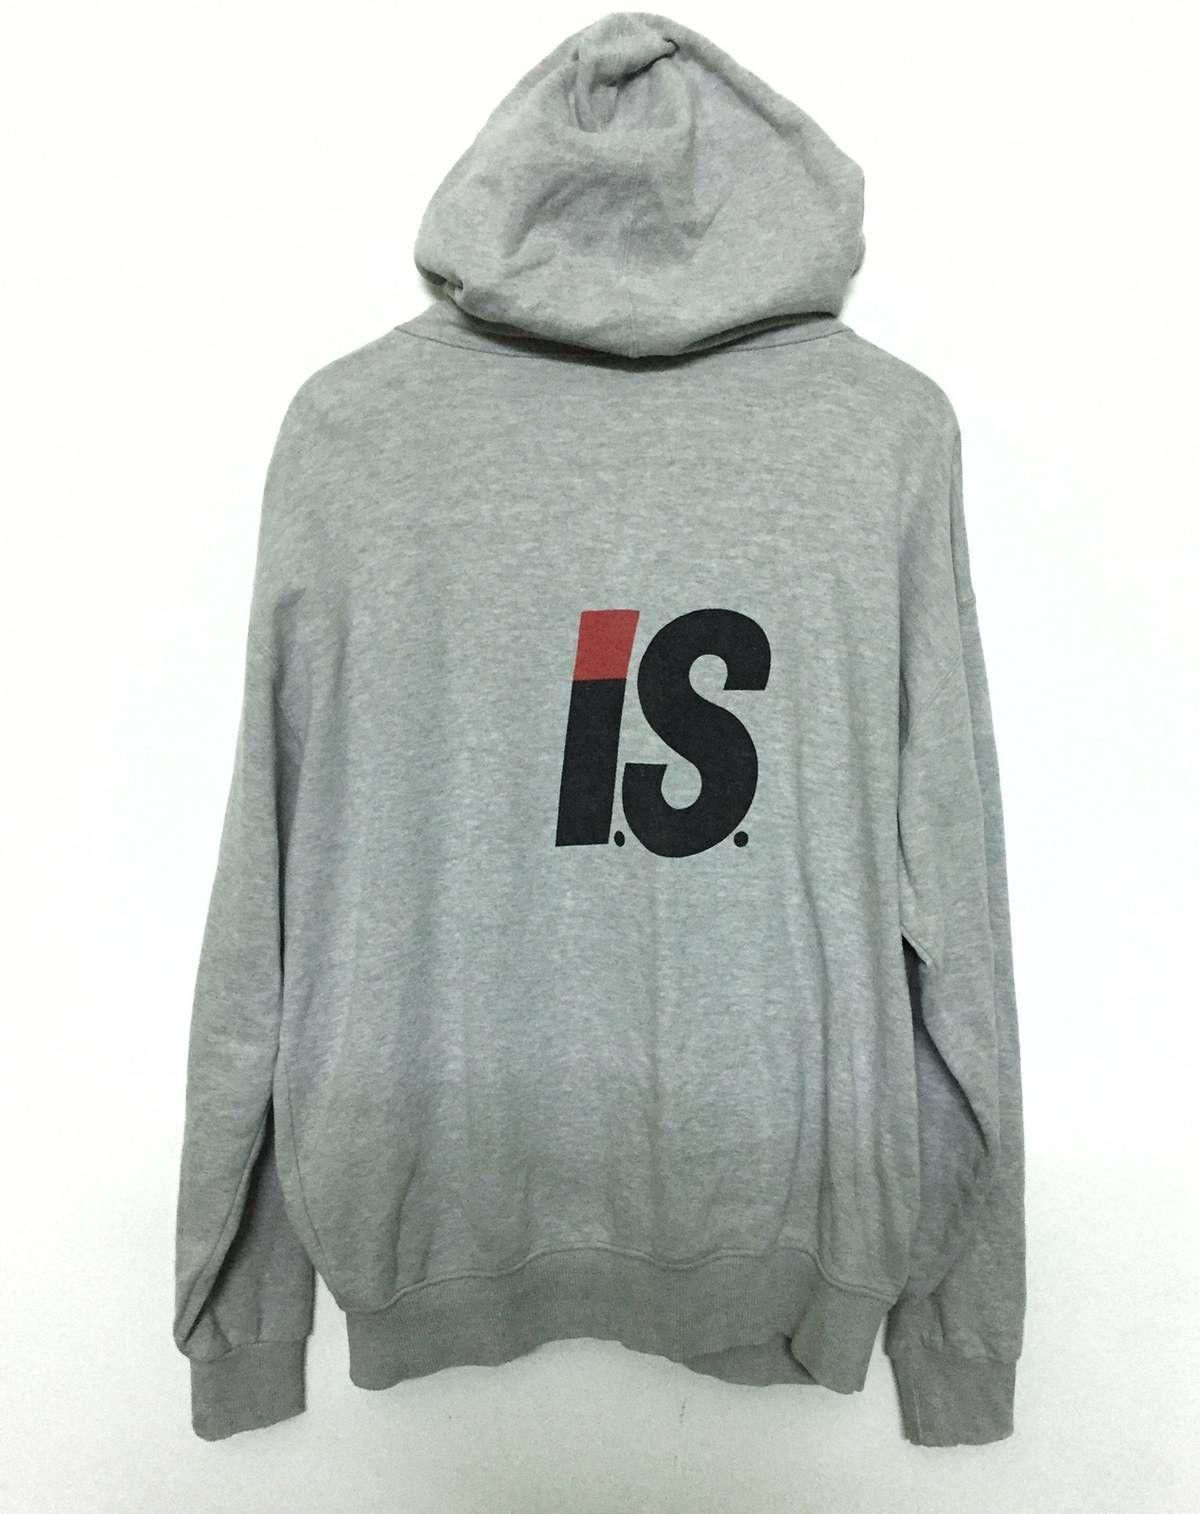 27ad30d4ad8a Issey Miyake 🔥🔥Vintage Sweatshirt Hoodie IS Issey Miyake Size l -  Sweatshirts   Hoodies for Sale - Grailed